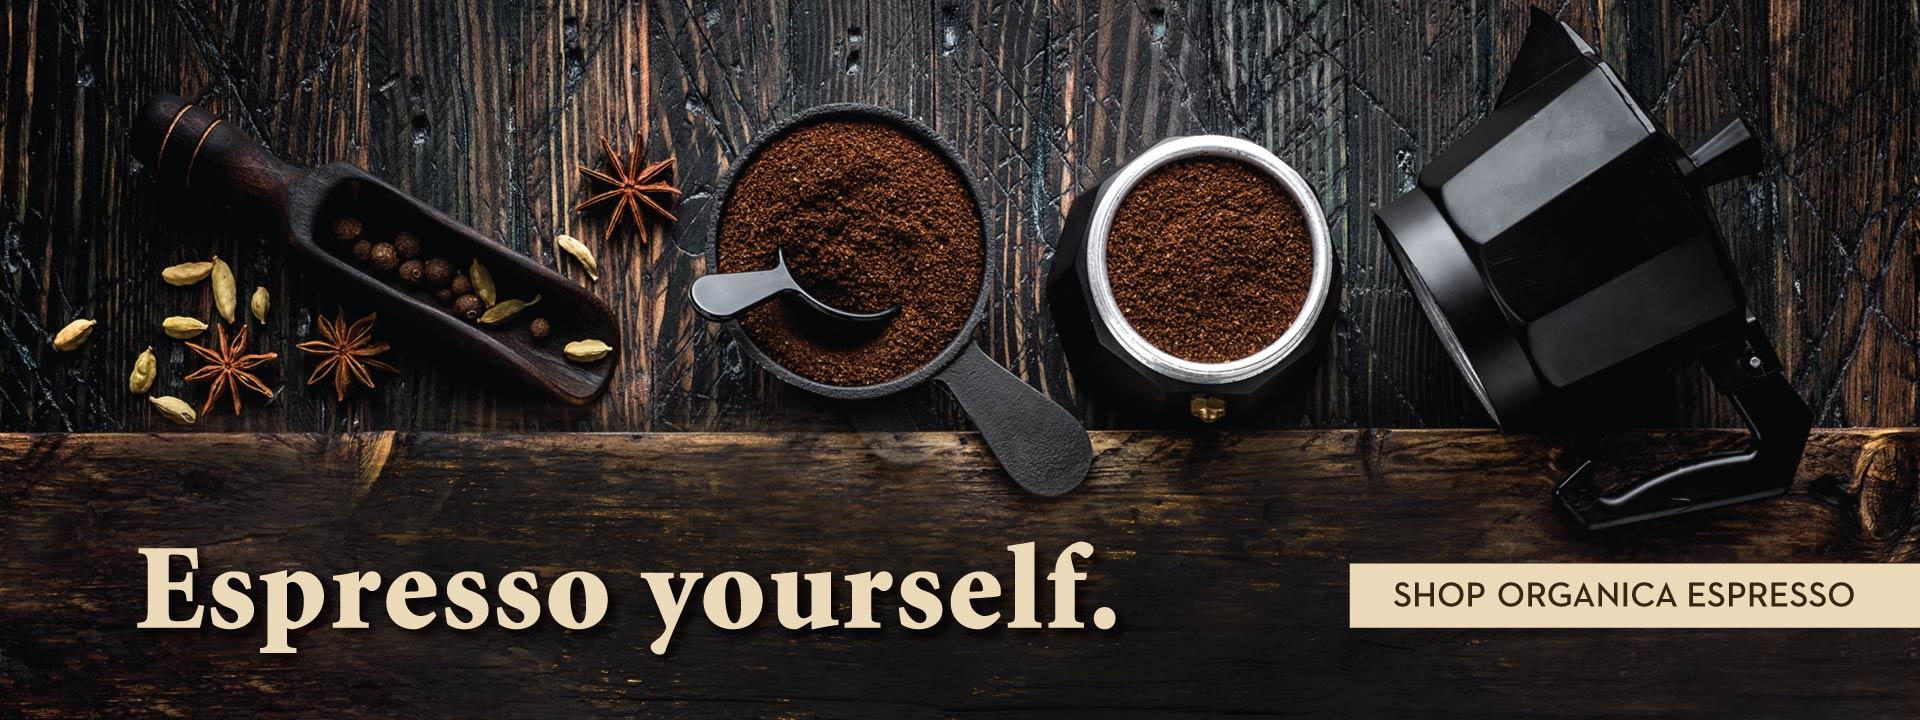 espresso-yourself